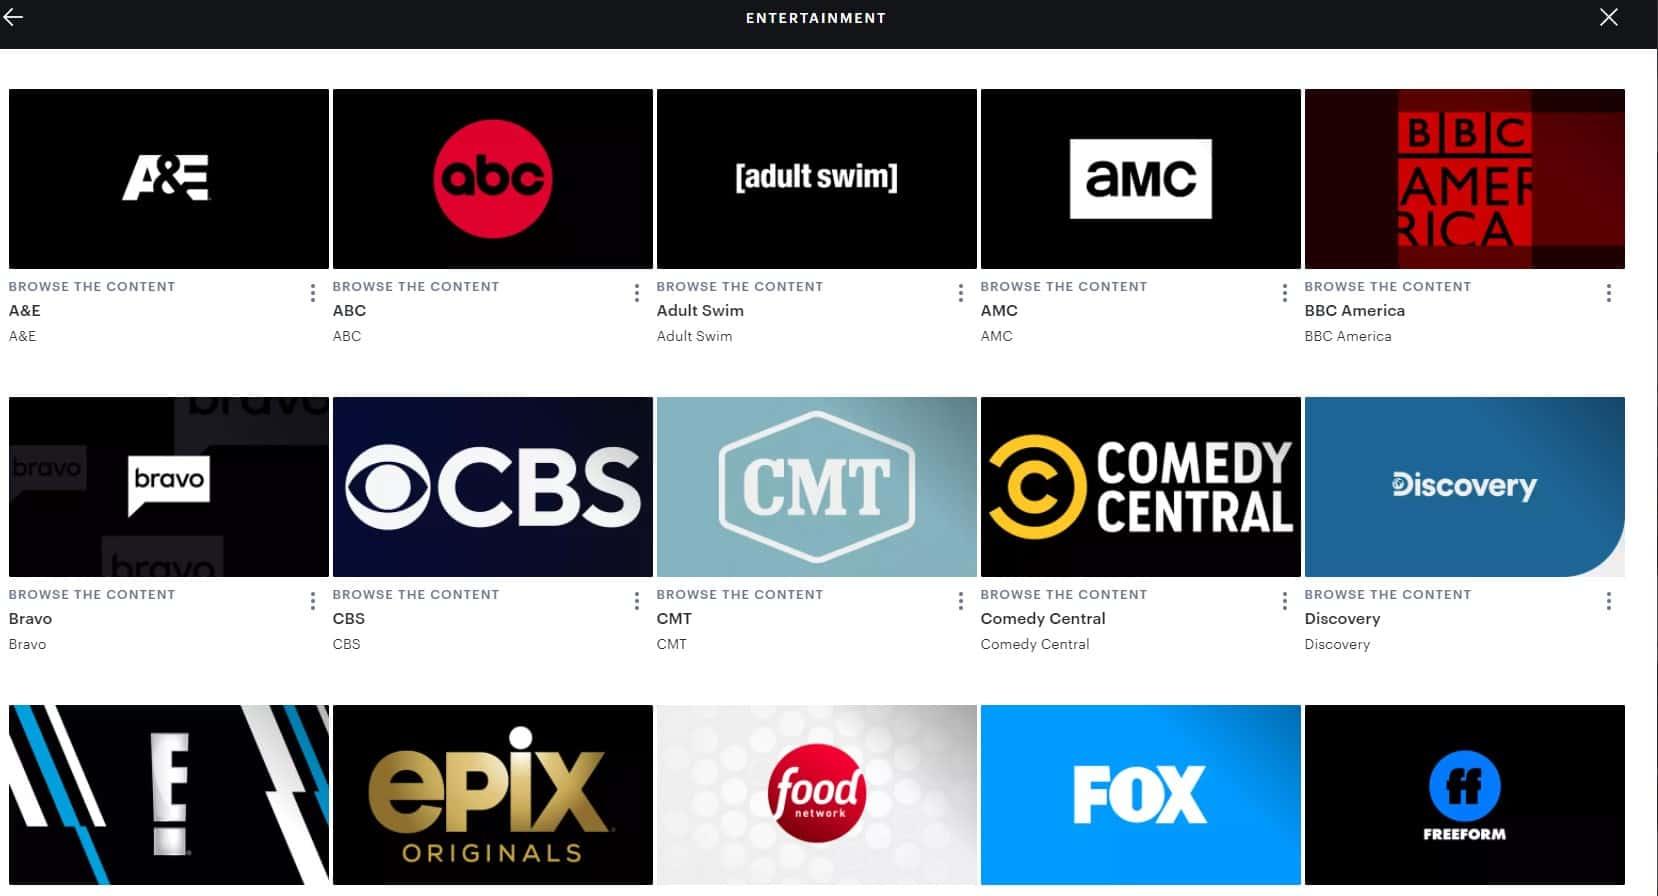 Hulu cable alternative